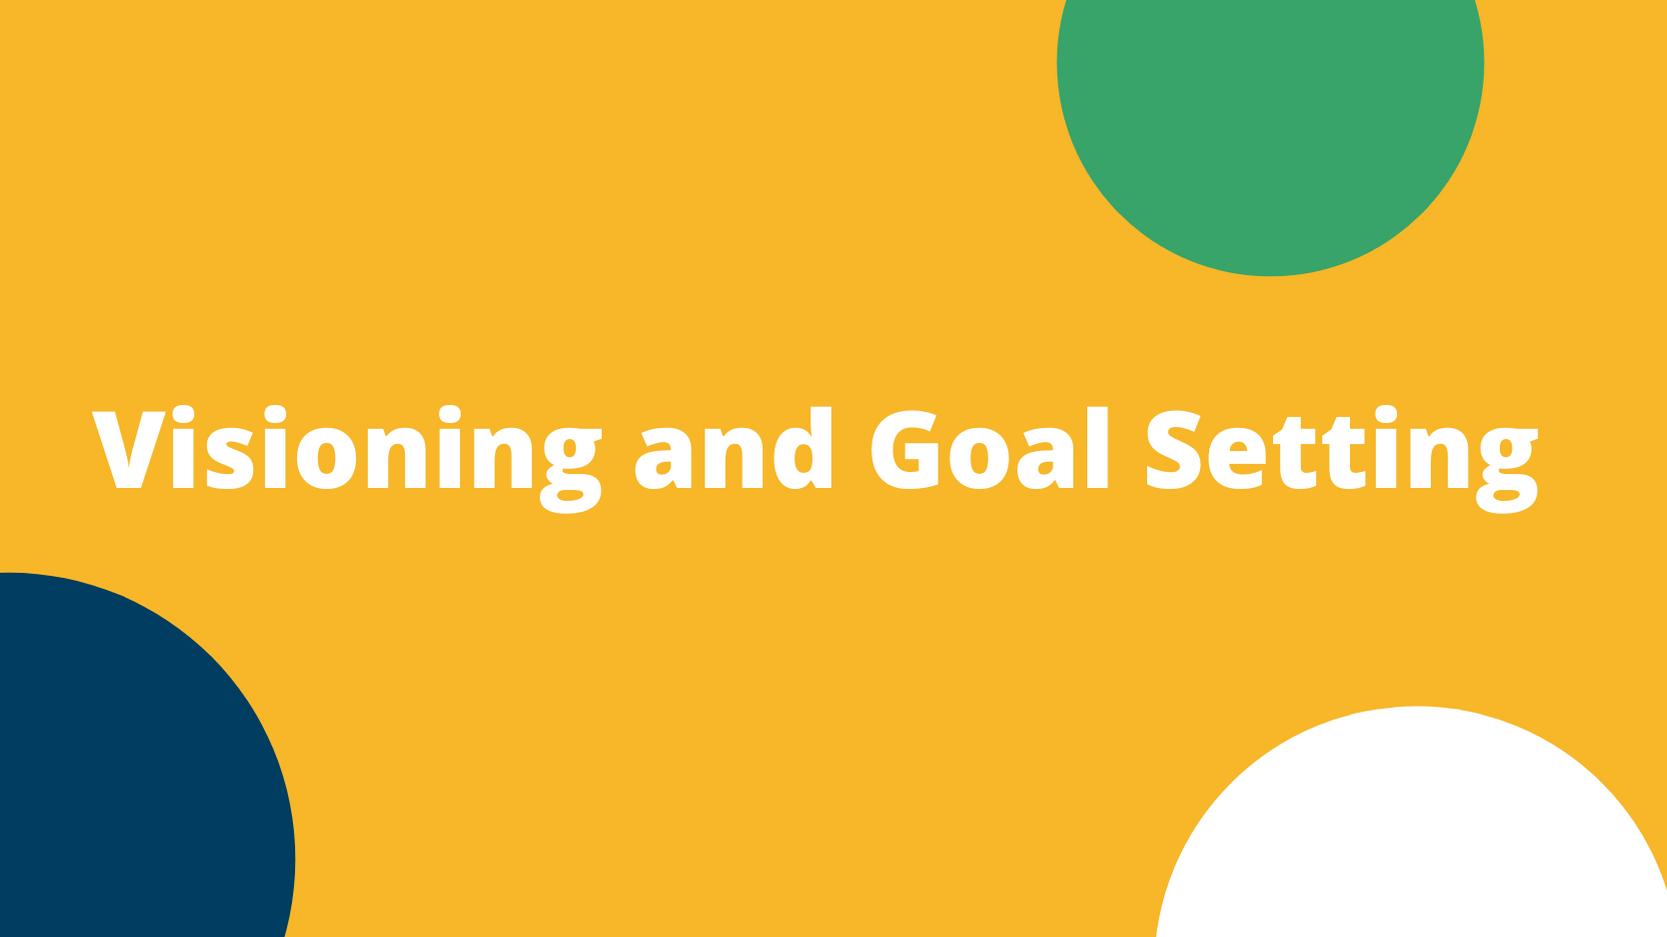 Virtual Visioning and Goal Setting (11/24/2020)